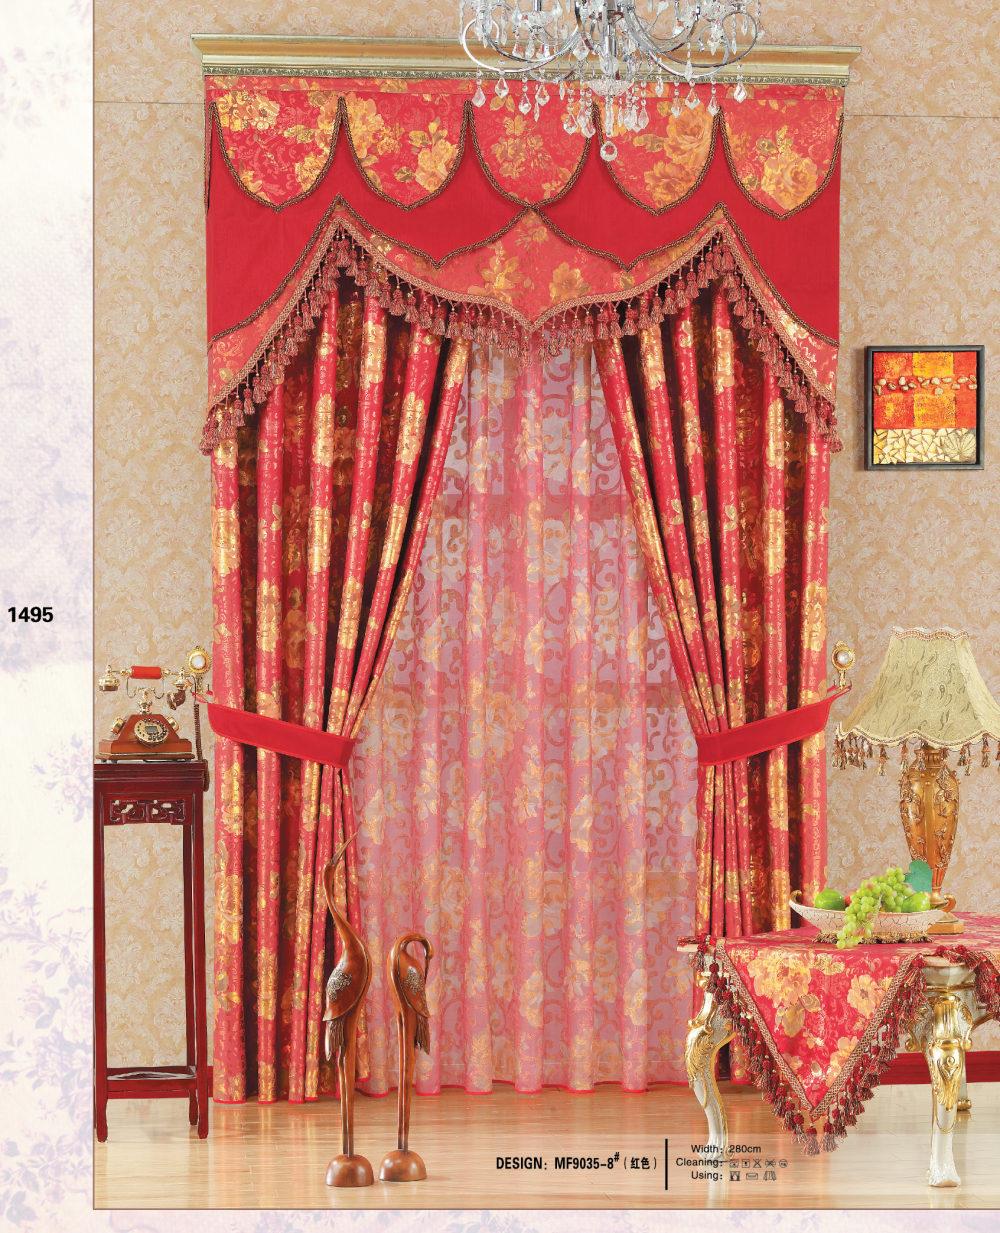 Aiden 收藏窗帘图片高清图(用方案里很清晰。)免费~_7.jpg